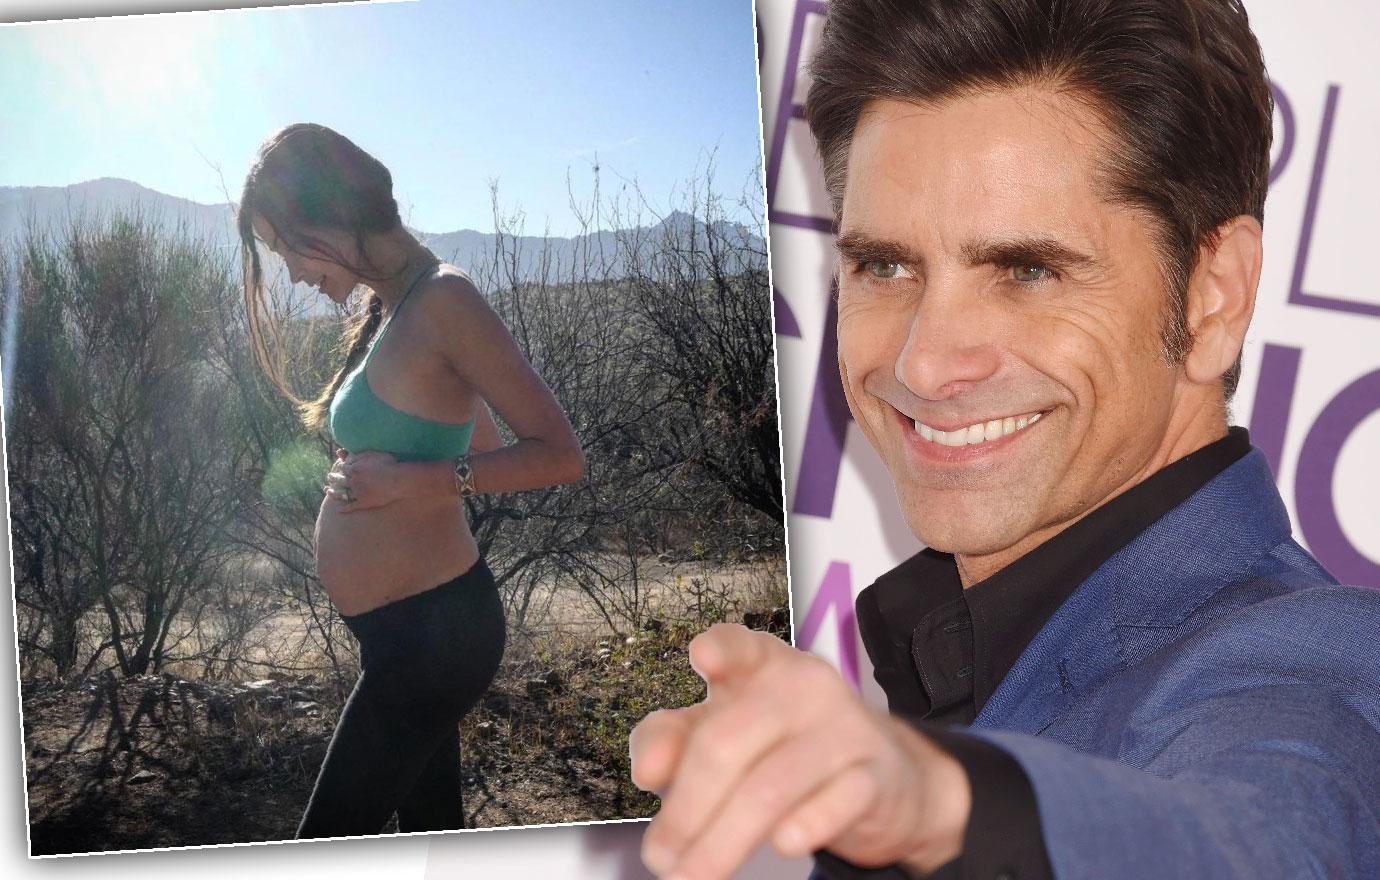 John Stamos Fiancee Posts Scantily Clad Baby Bump Pic